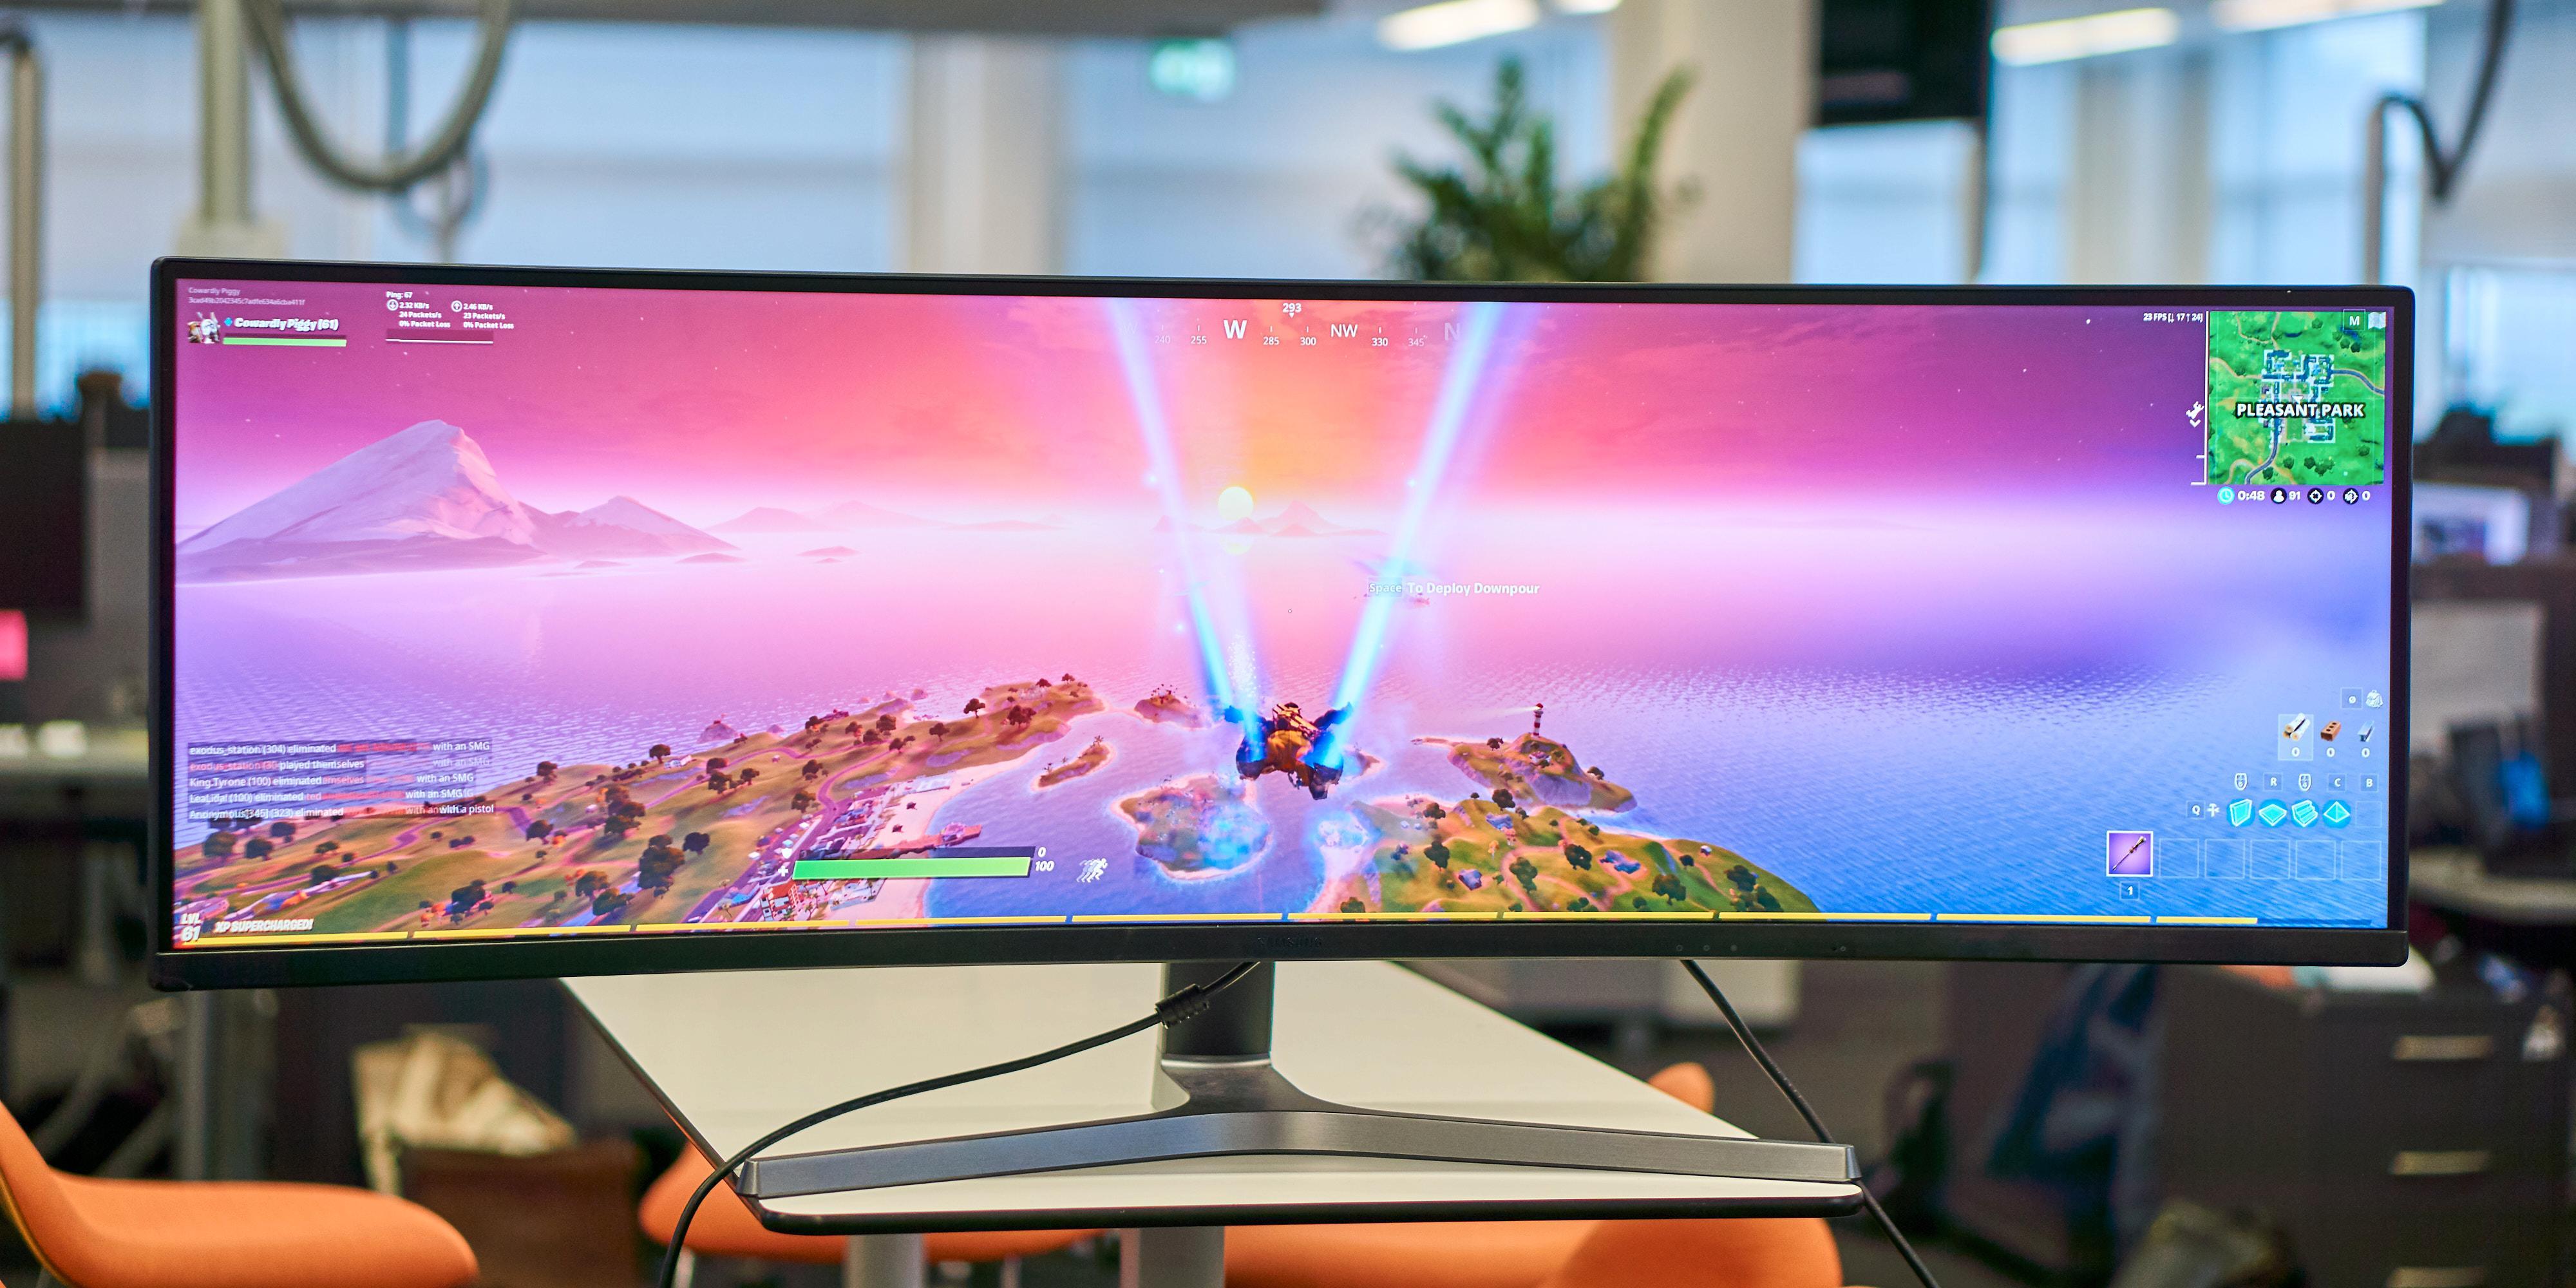 Ultrabrede skjermer er et imponerende syn på pulten.